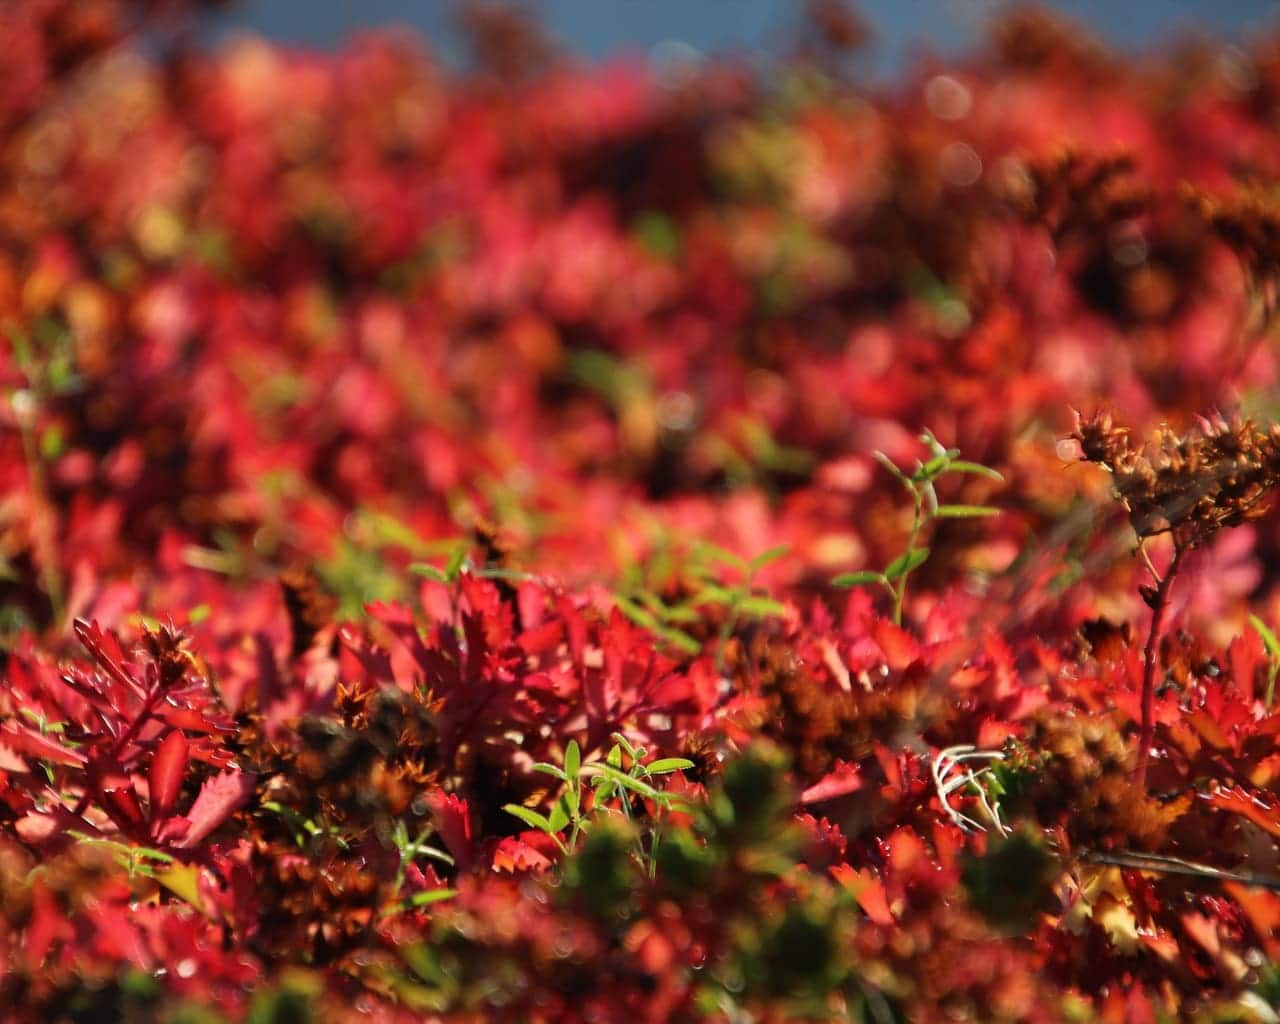 Sedum floriferum - Fette Henne - Herbstfärbung